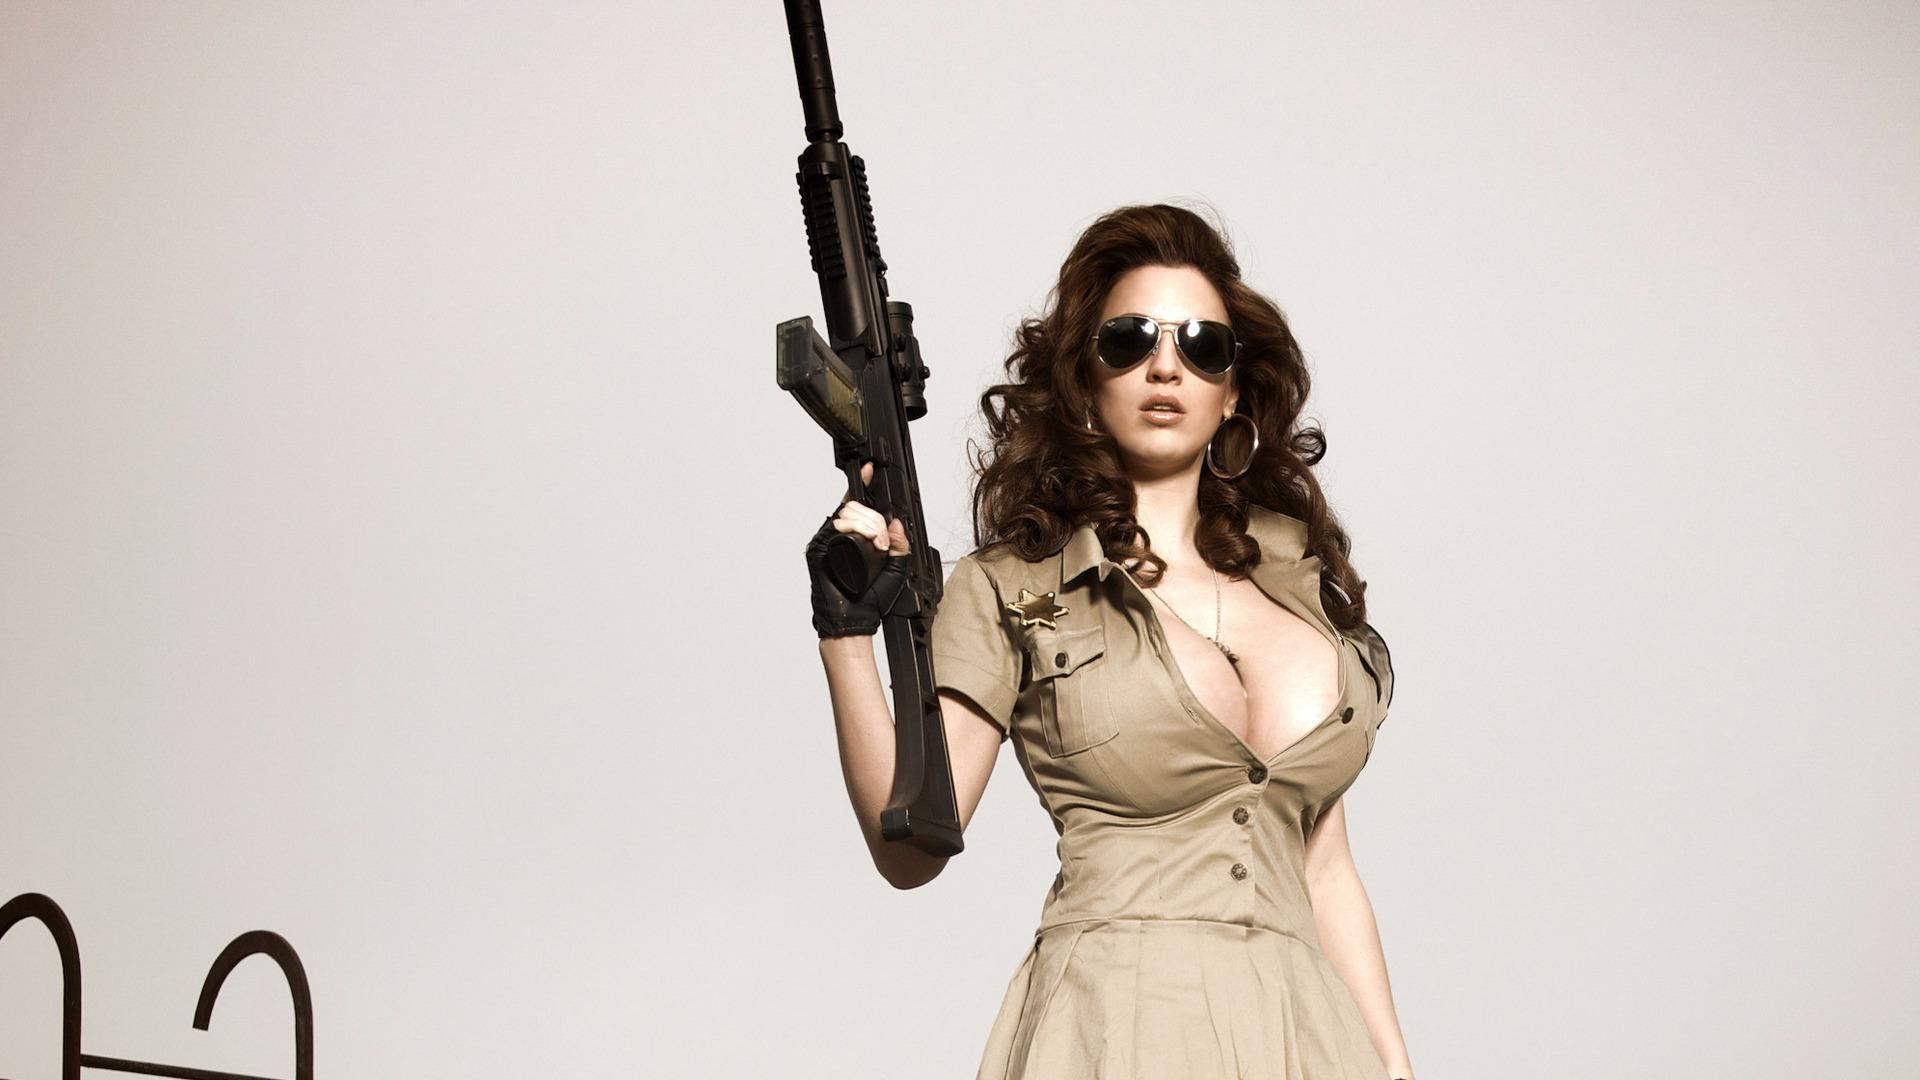 Copia di gun vector military with girl full screen hd wallpaper